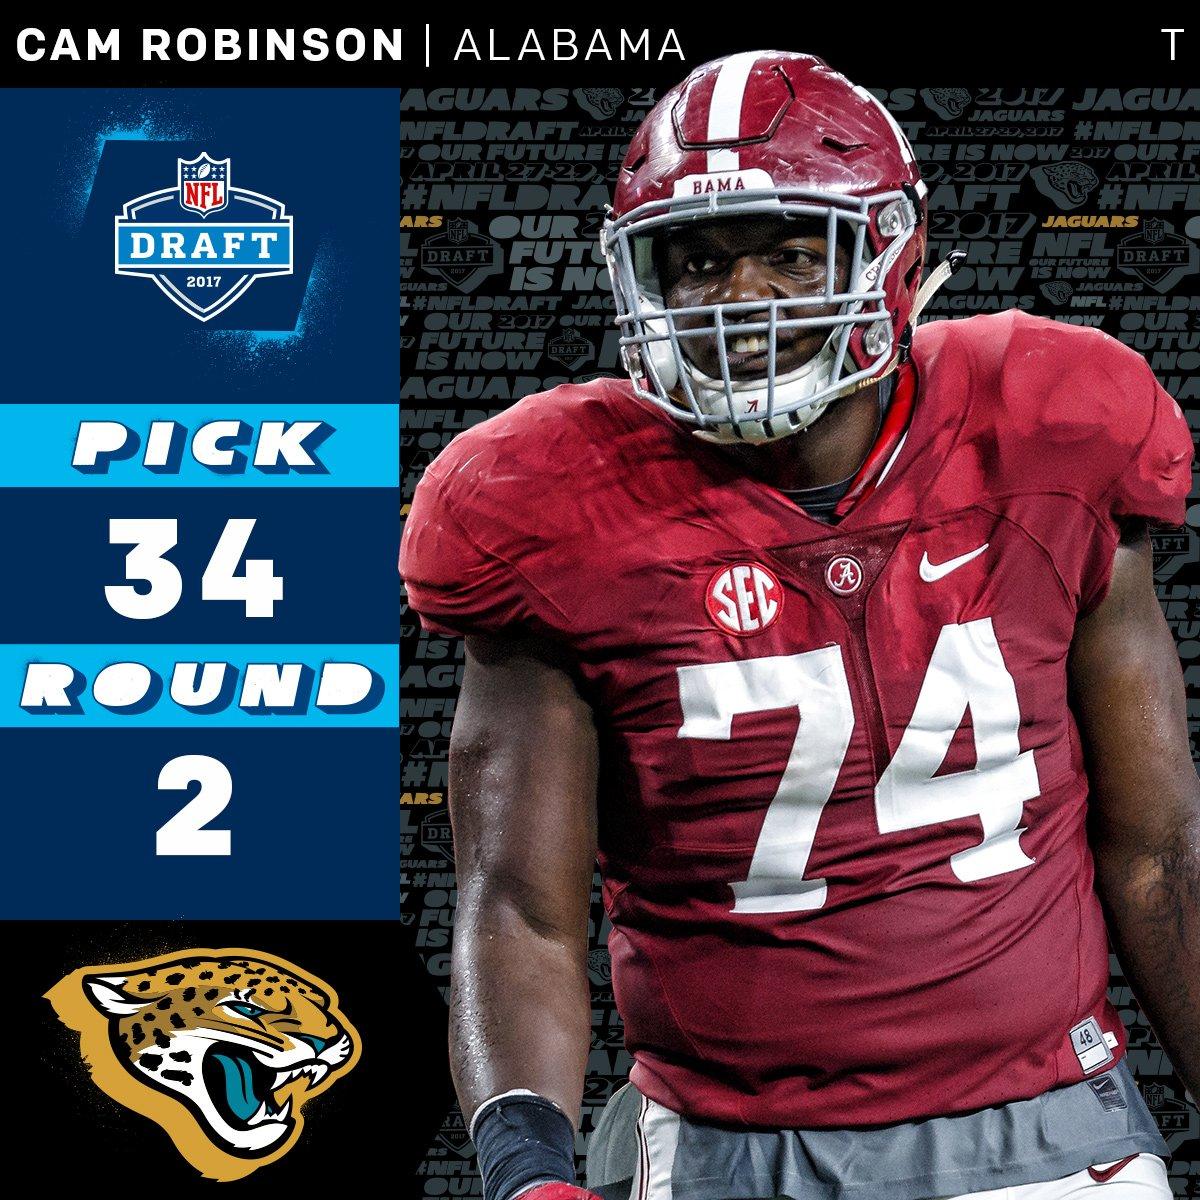 34 - Cam Robinson